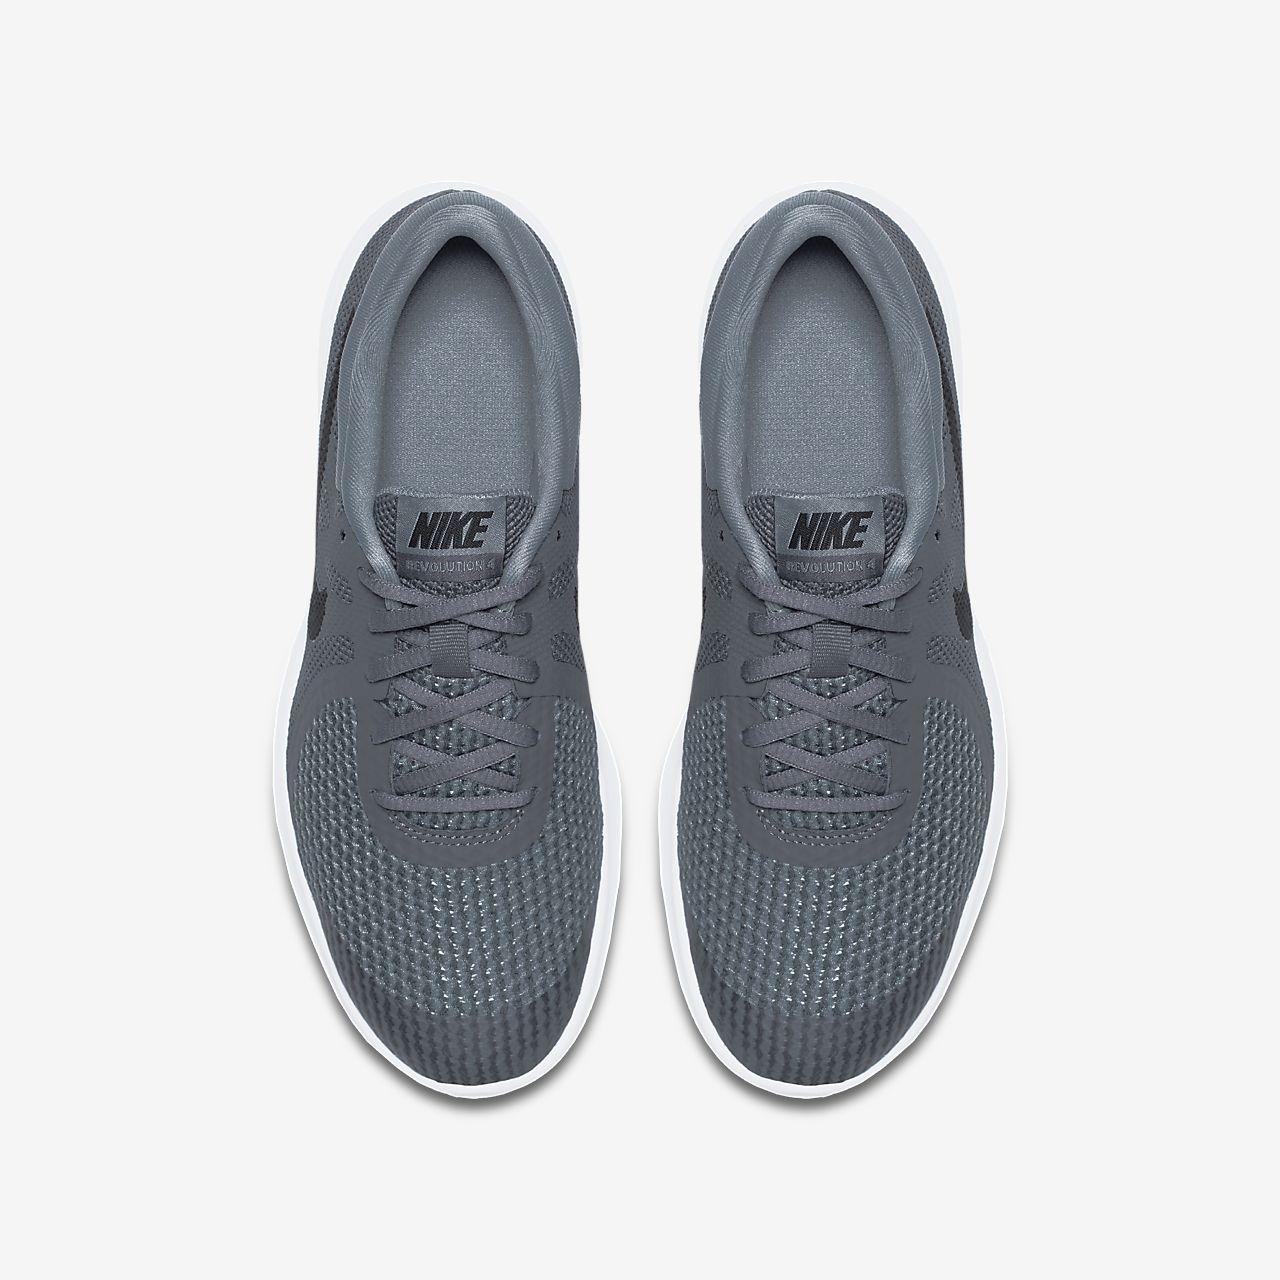 sports shoes 60704 f68c7 ... where can i buy calzado de running para niños talla grande nike  revolution 4 835aa a1fc8